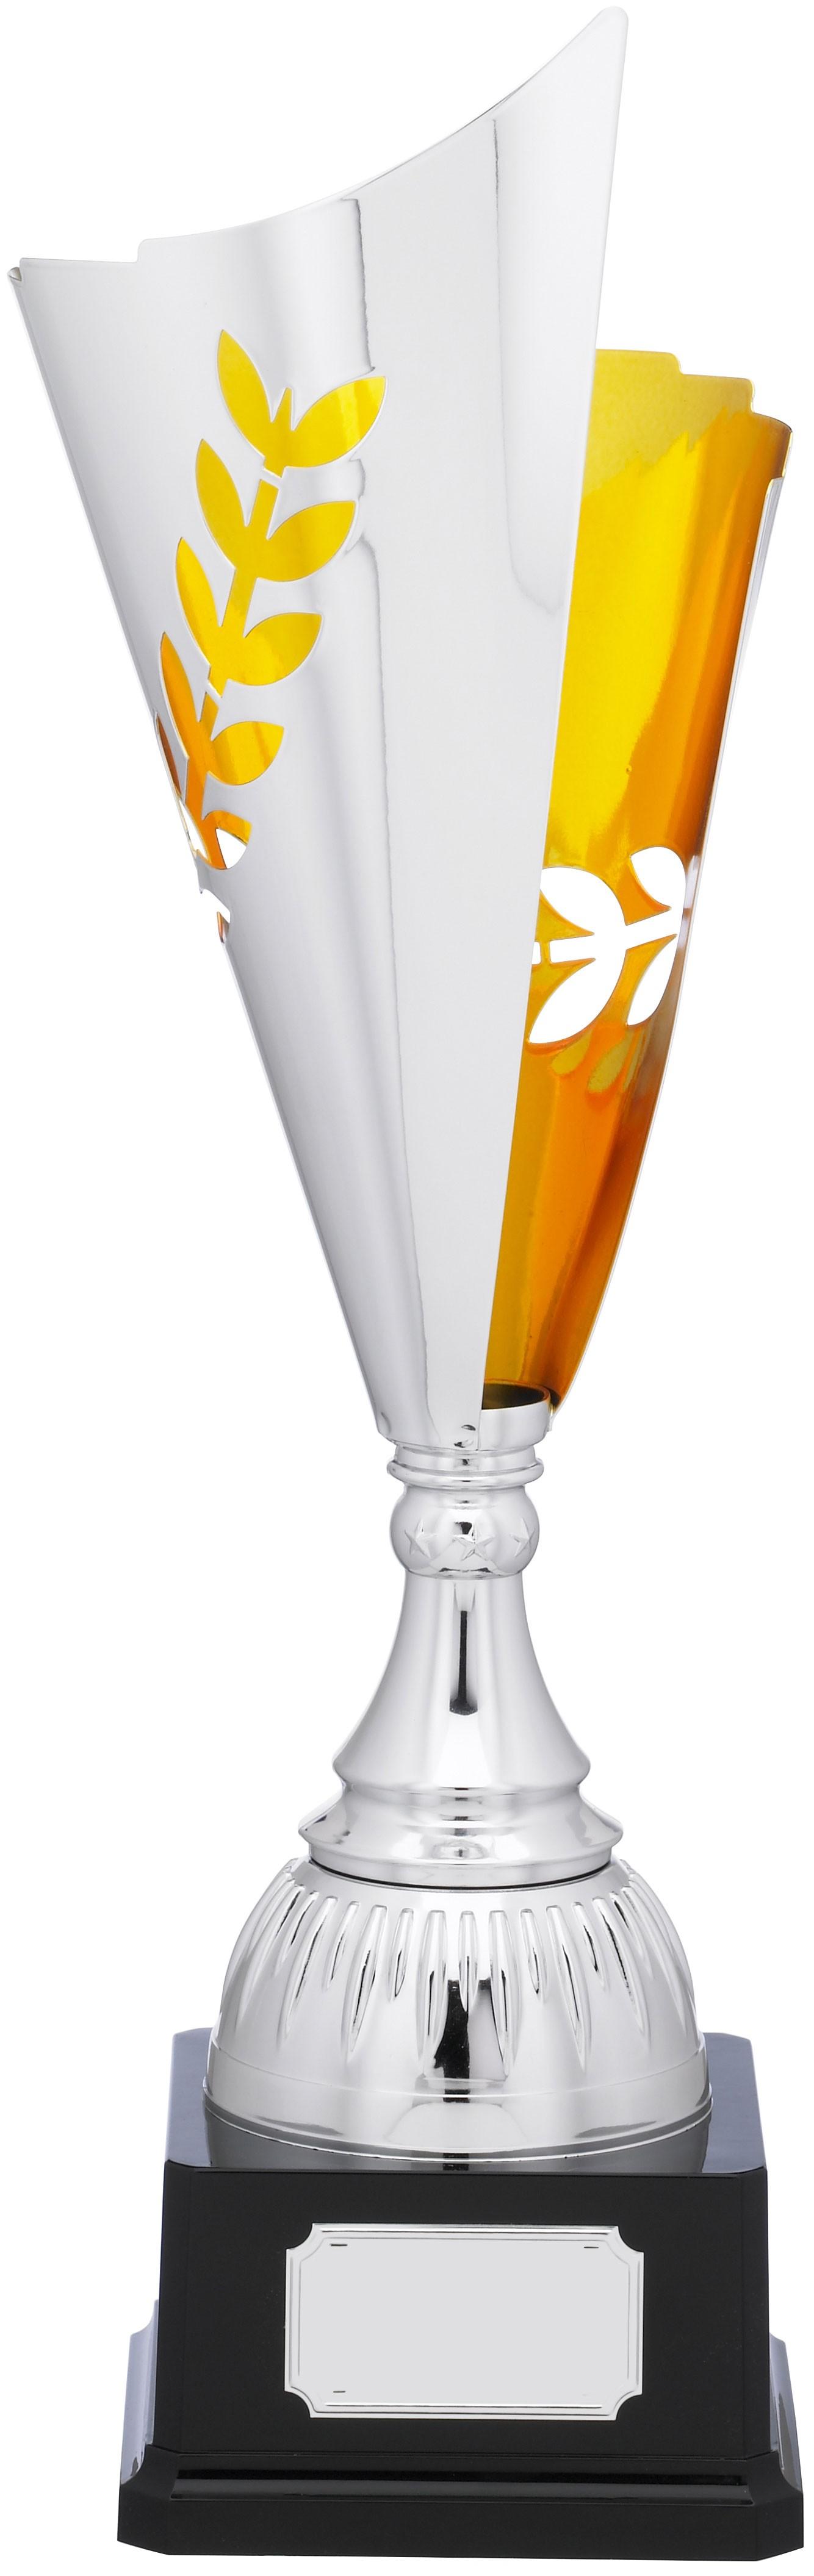 Silver Gold Trophy - 46cm